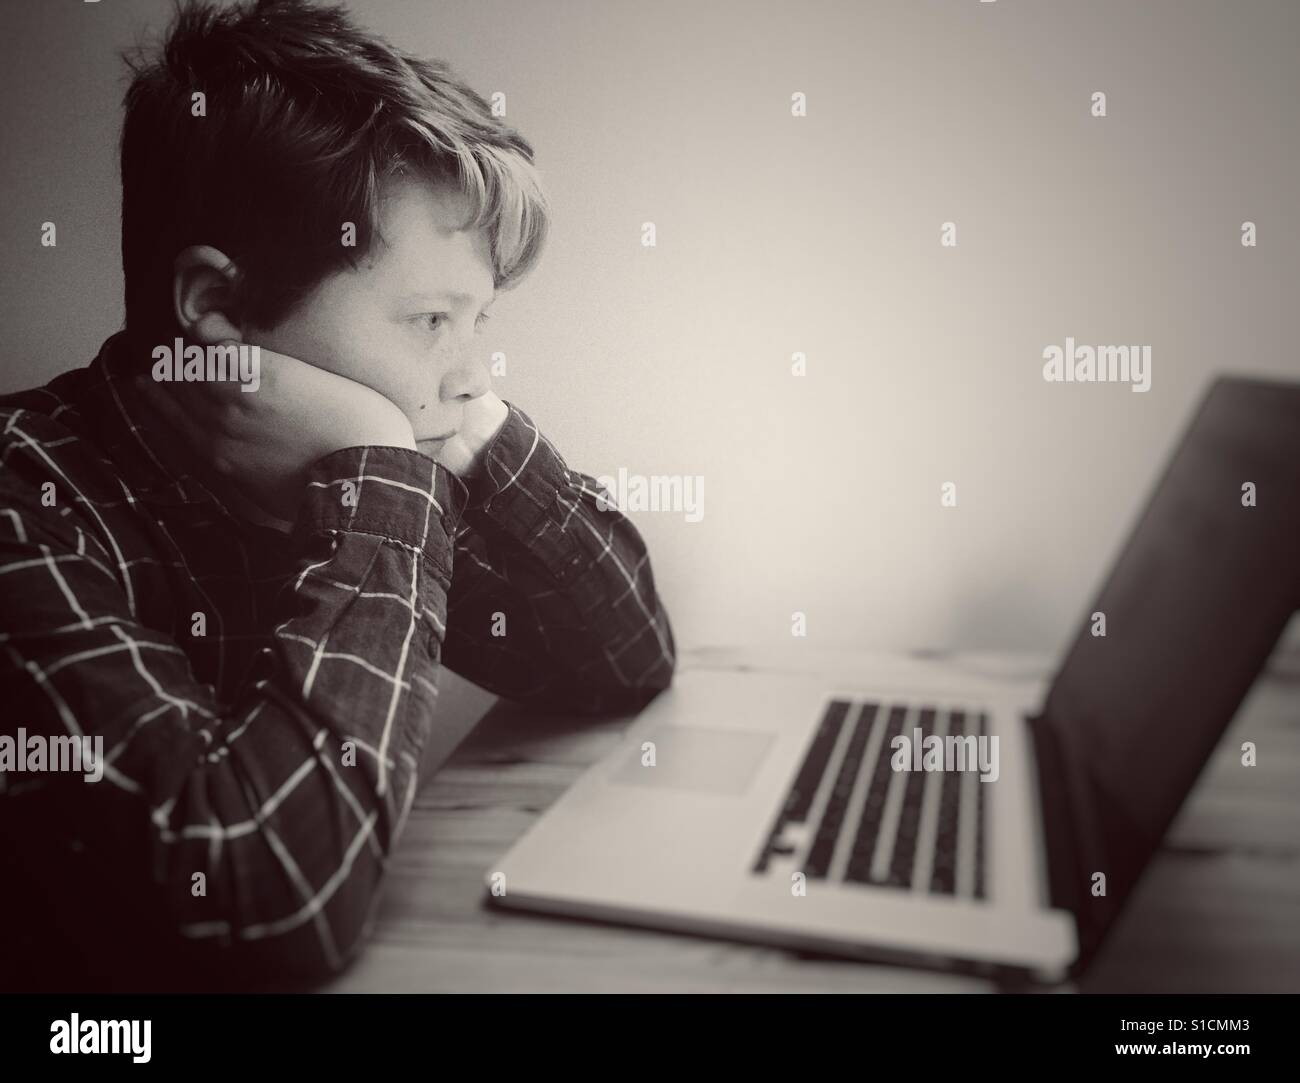 11-year old boy using laptop computer - Stock Image